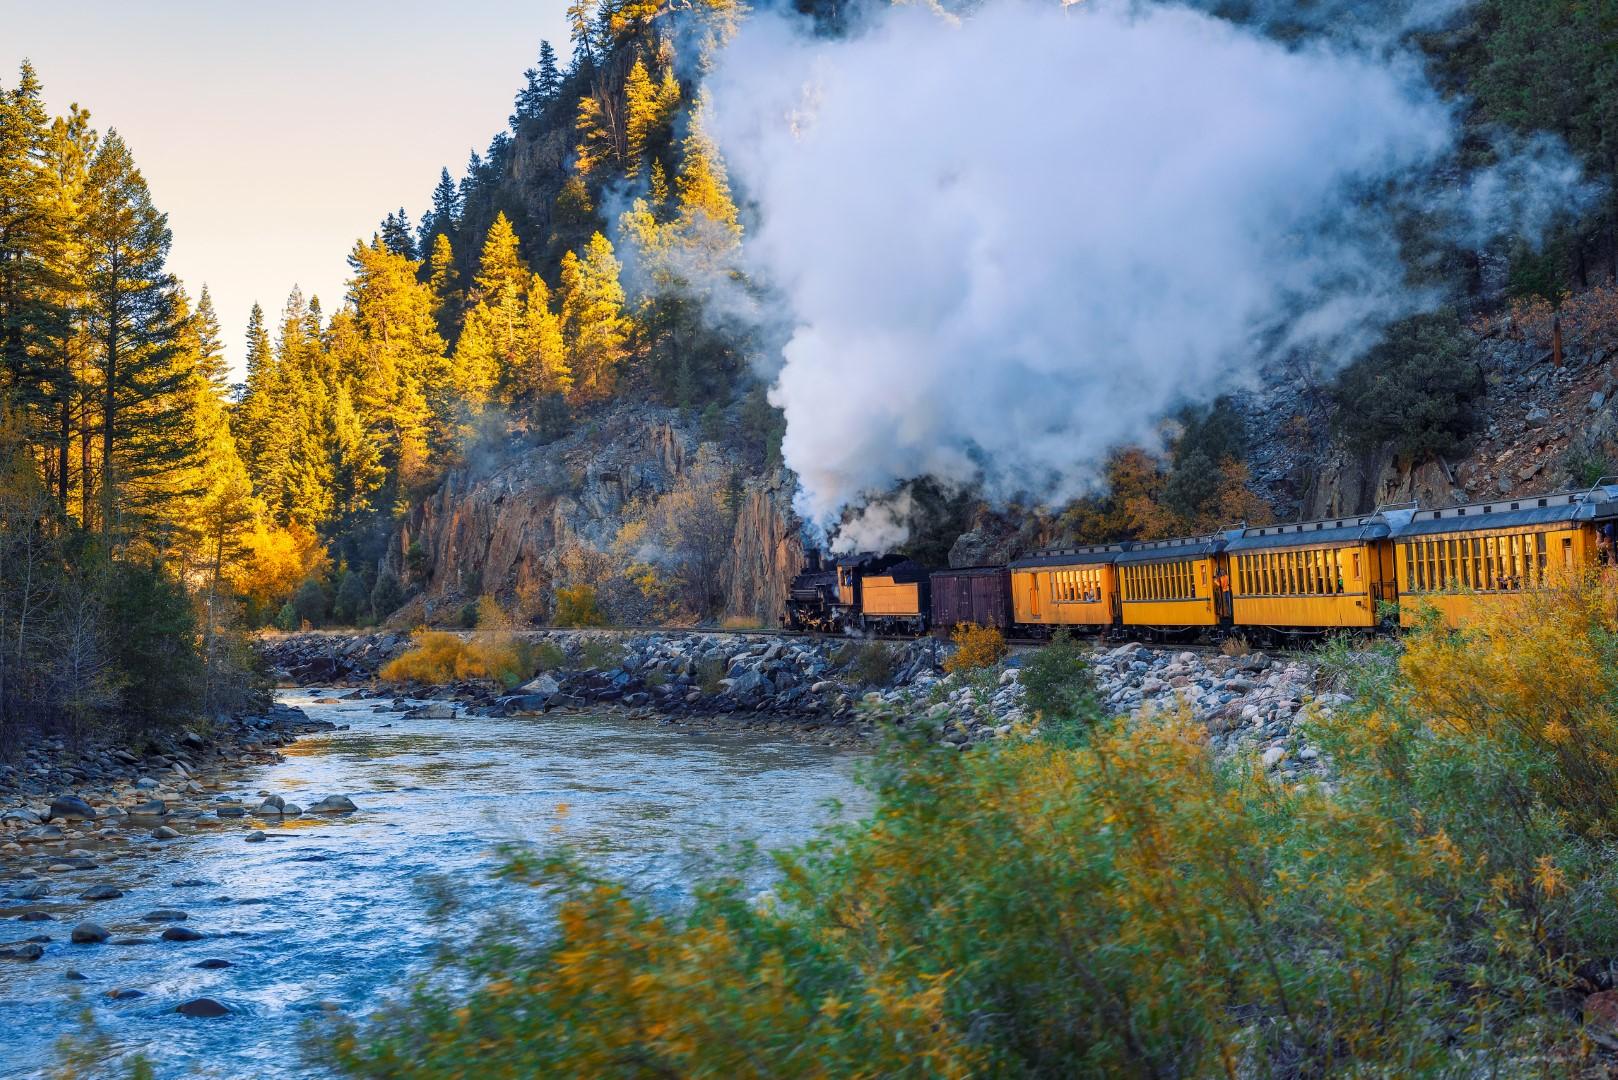 wp-content/uploads/itineraries/USA/CoMtn/durango-train.jpg